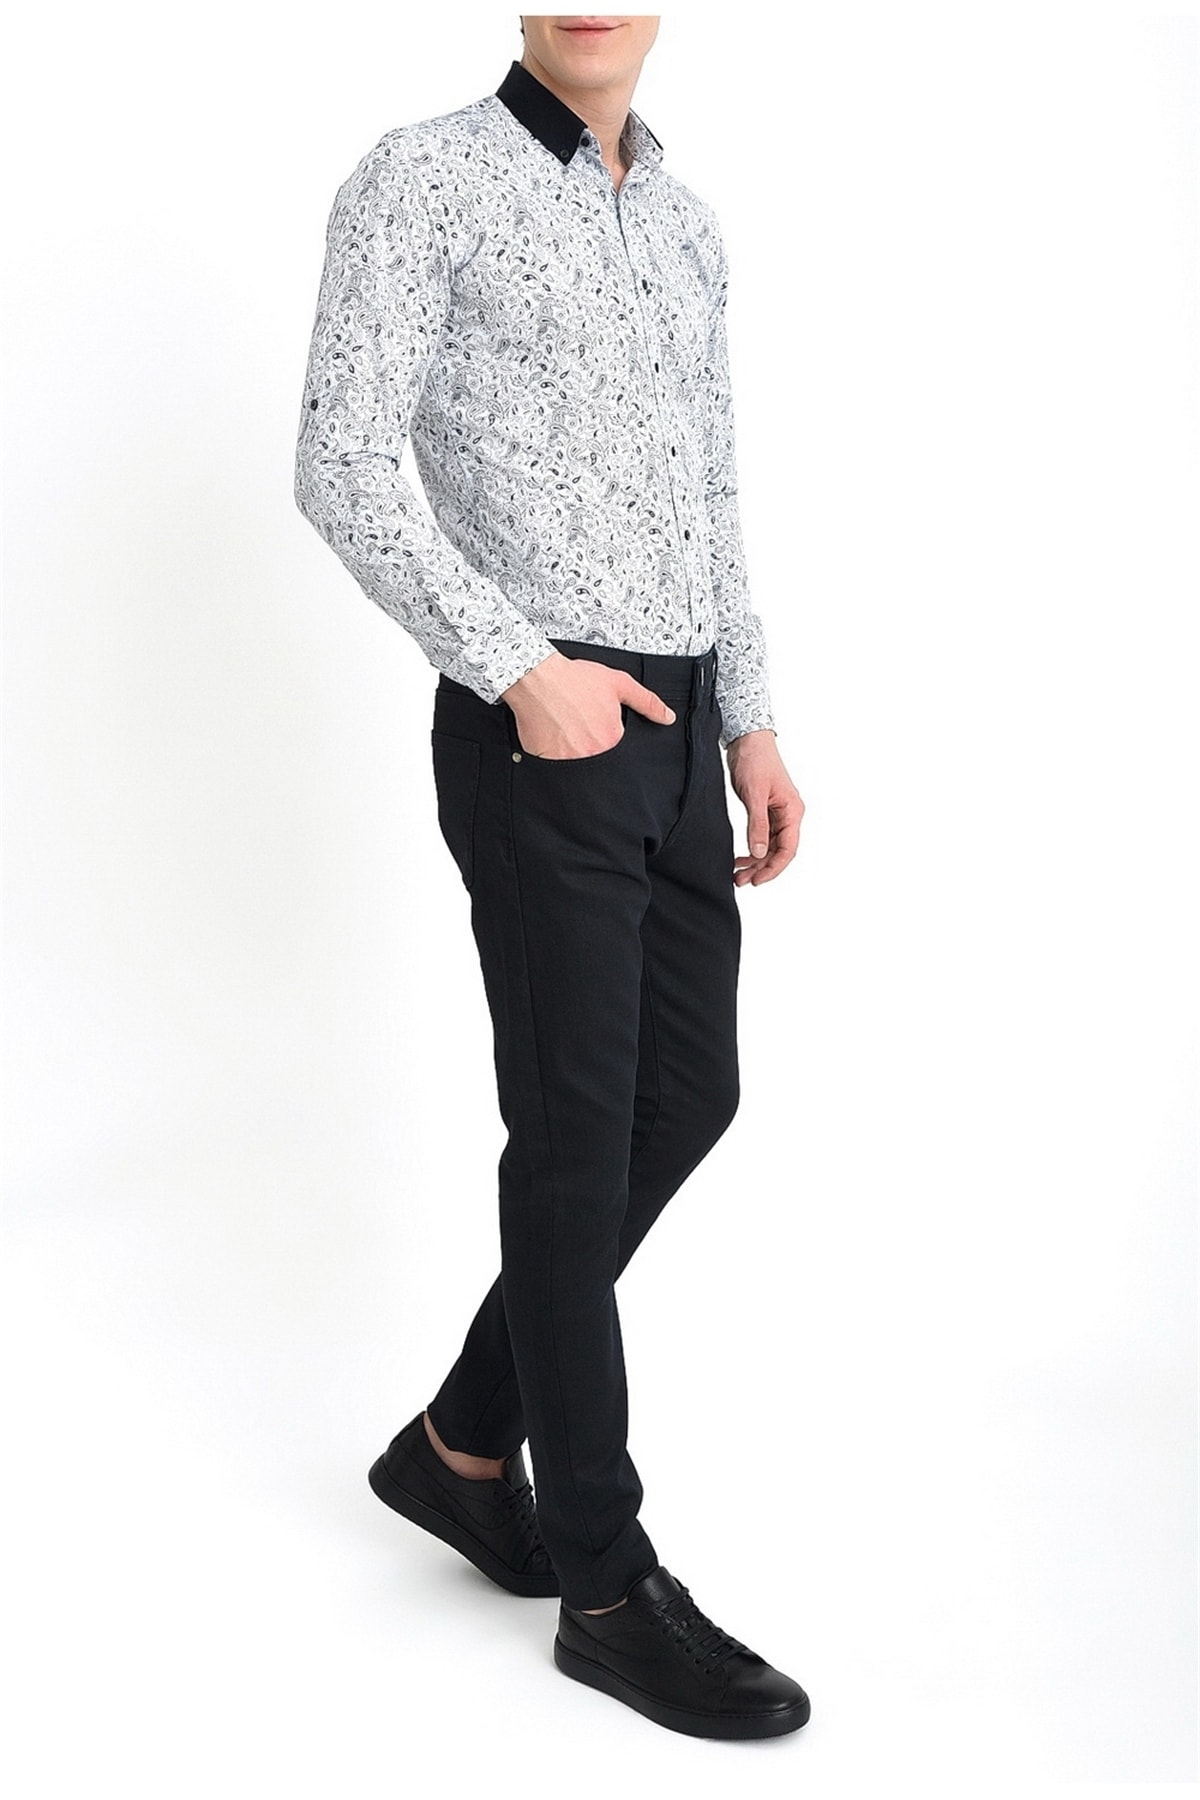 Efor Erkek Lacivert Slim Fit Kanvas Pantolon 036 2